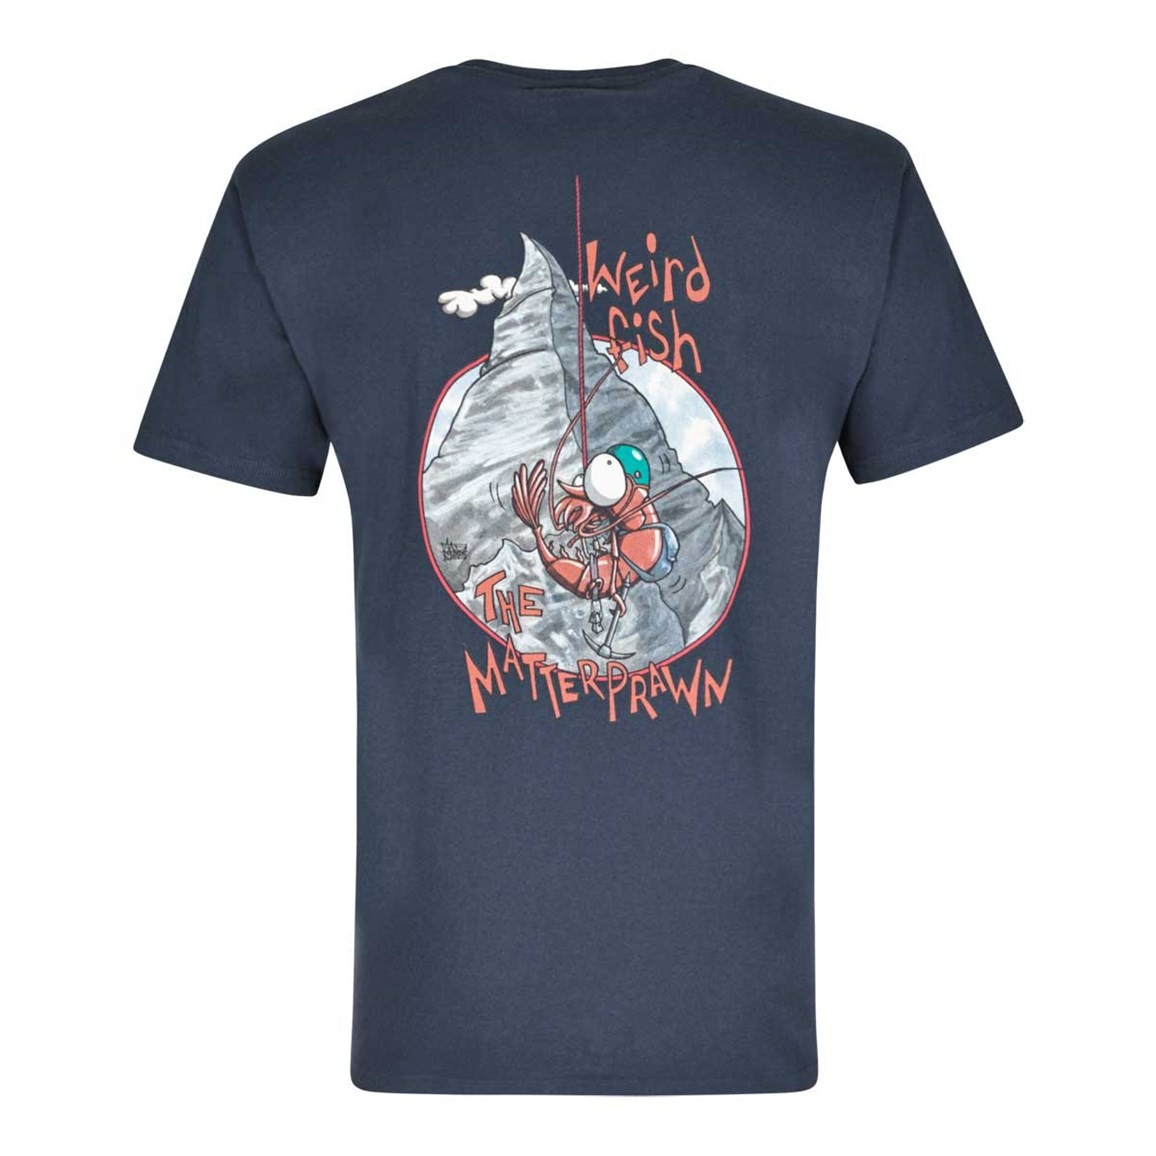 Matterprawn Printed Artist T-Shirt Dark Navy